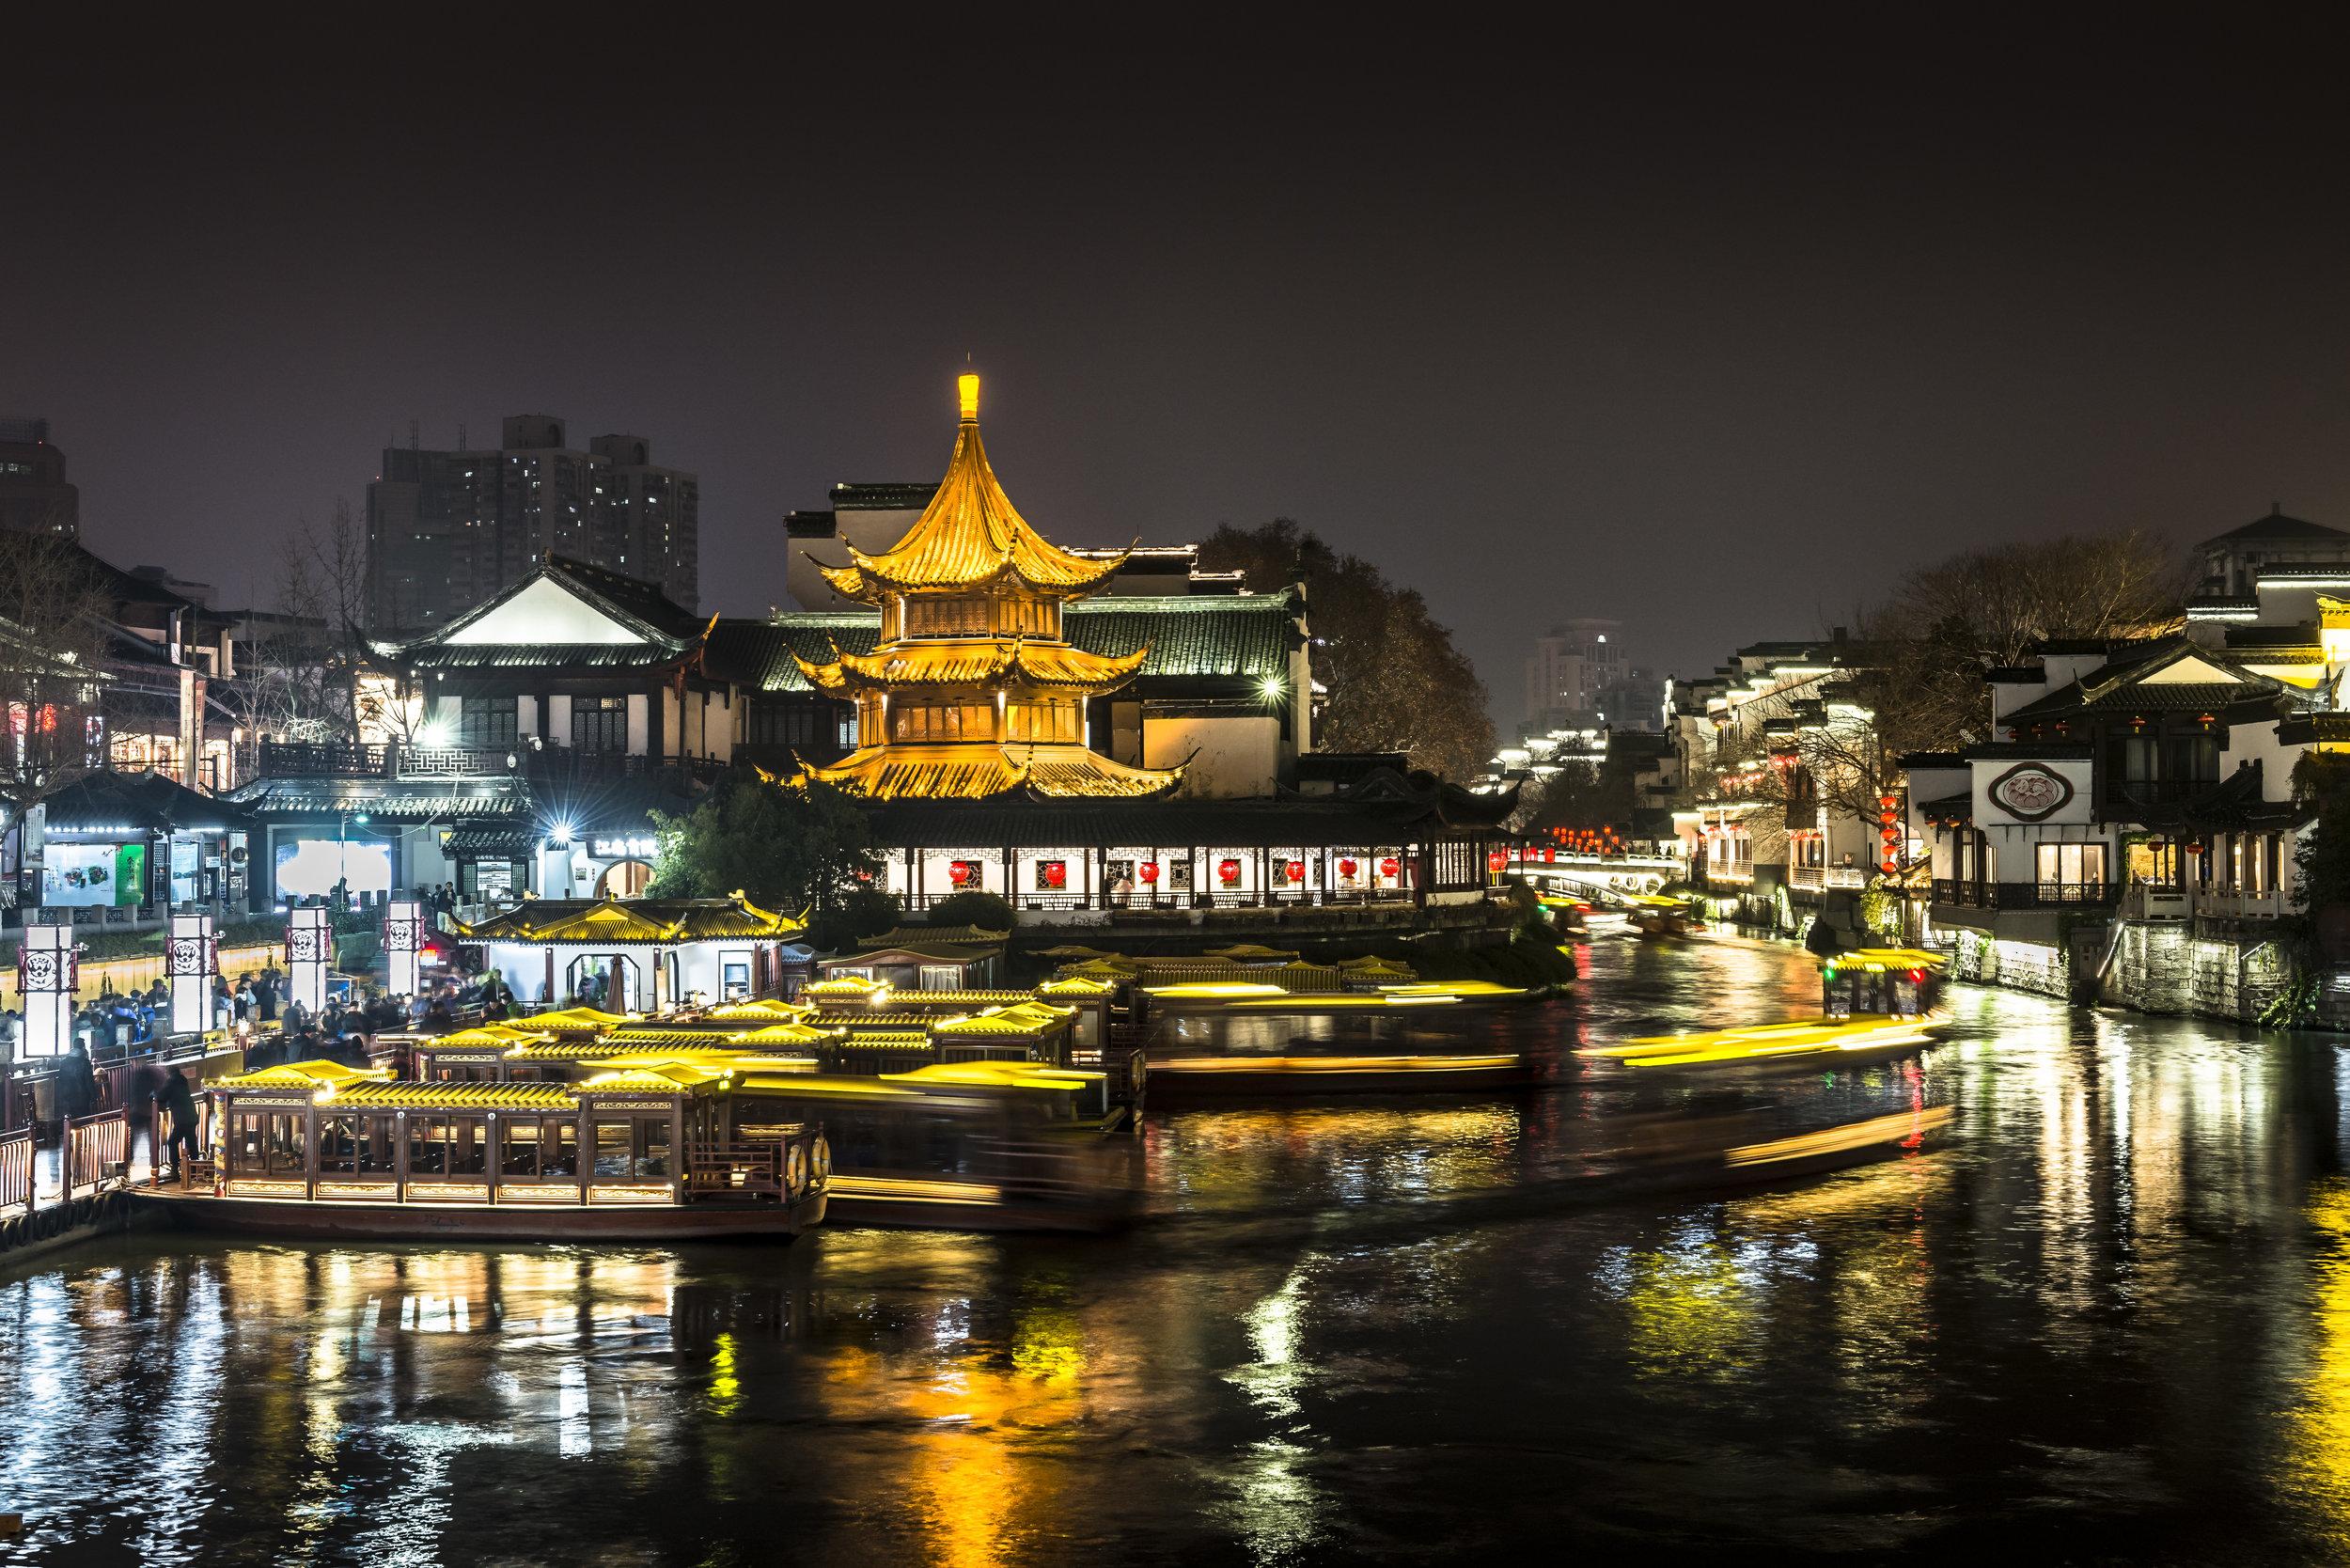 tourboats.jpg